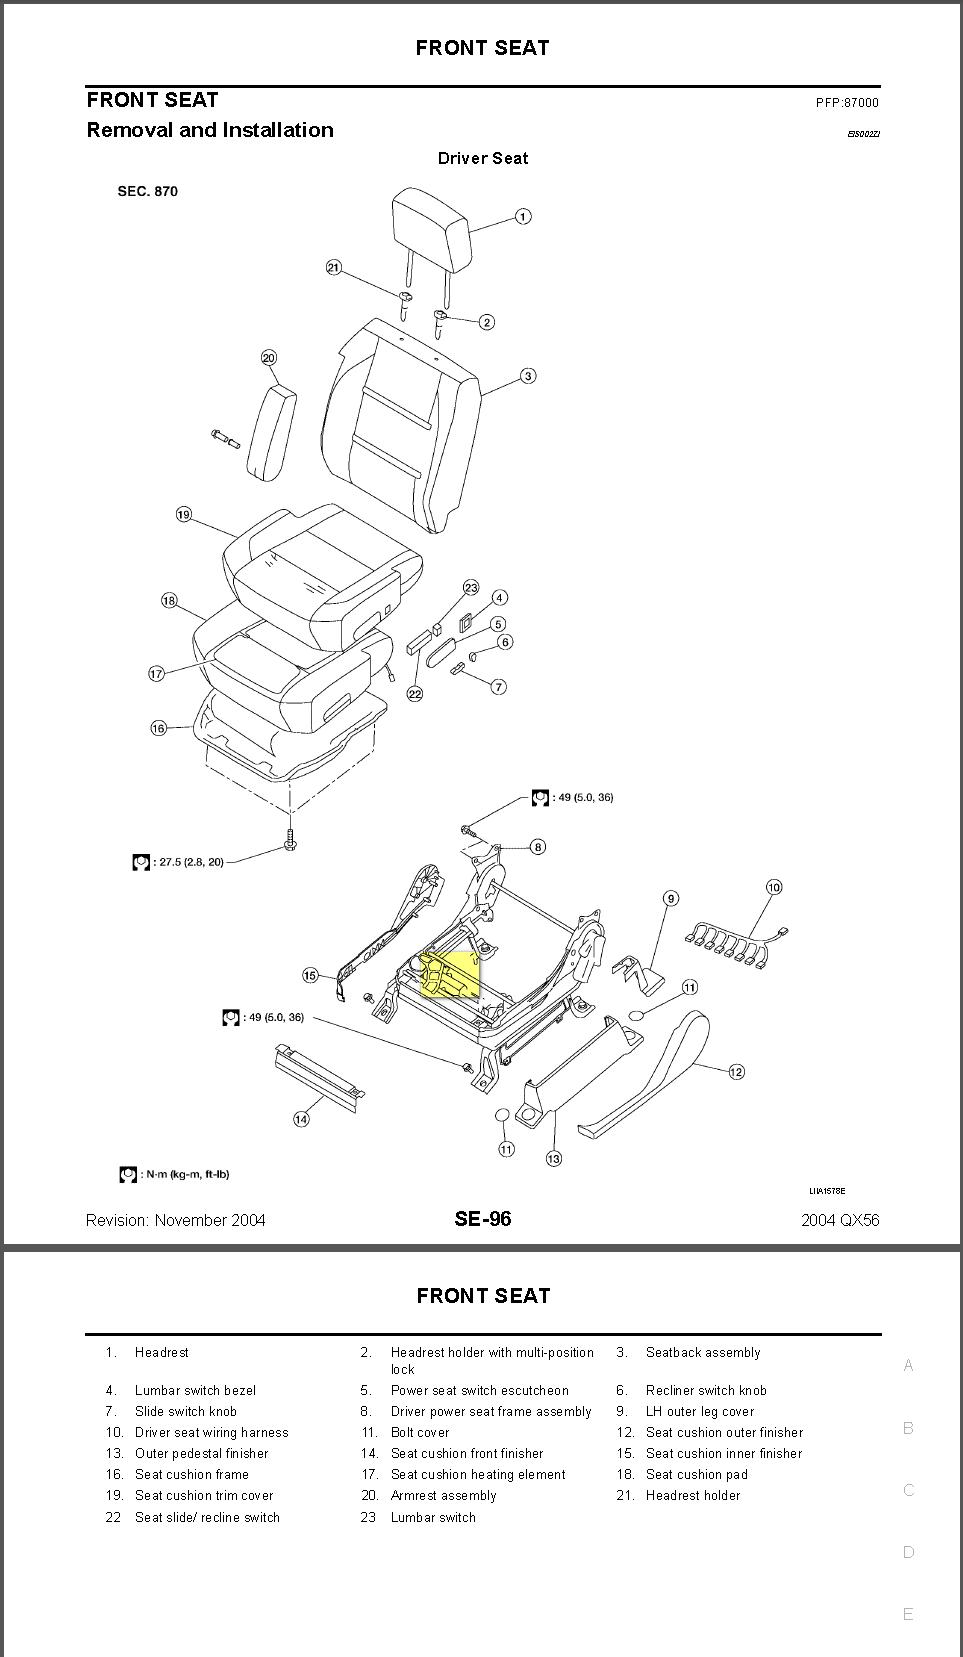 I have a 2006 Infiniti QX56. I got in my vehicle the other ... Infiniti Qx Wiring Diagram on infiniti parts, infiniti accessories, infiniti transfer case, infiniti g20 repair manual, infiniti fuses,